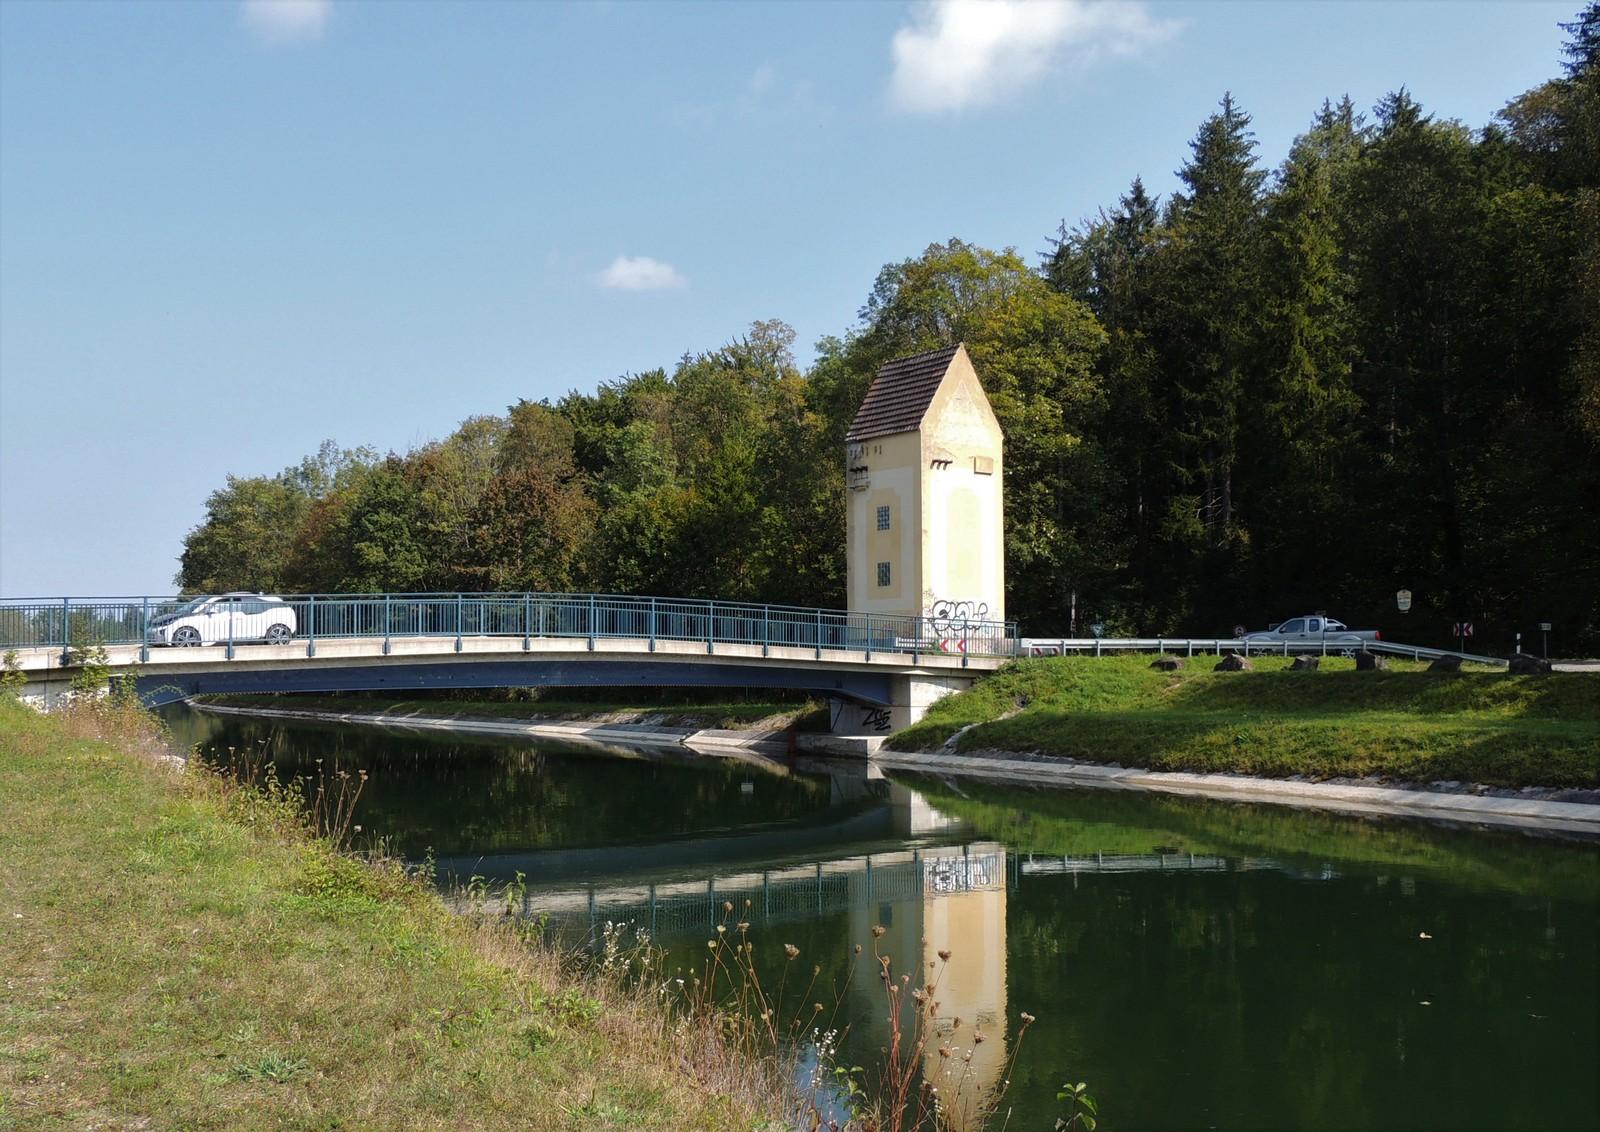 Grünwald-Rundkurs - Brücke über den Isarkanal